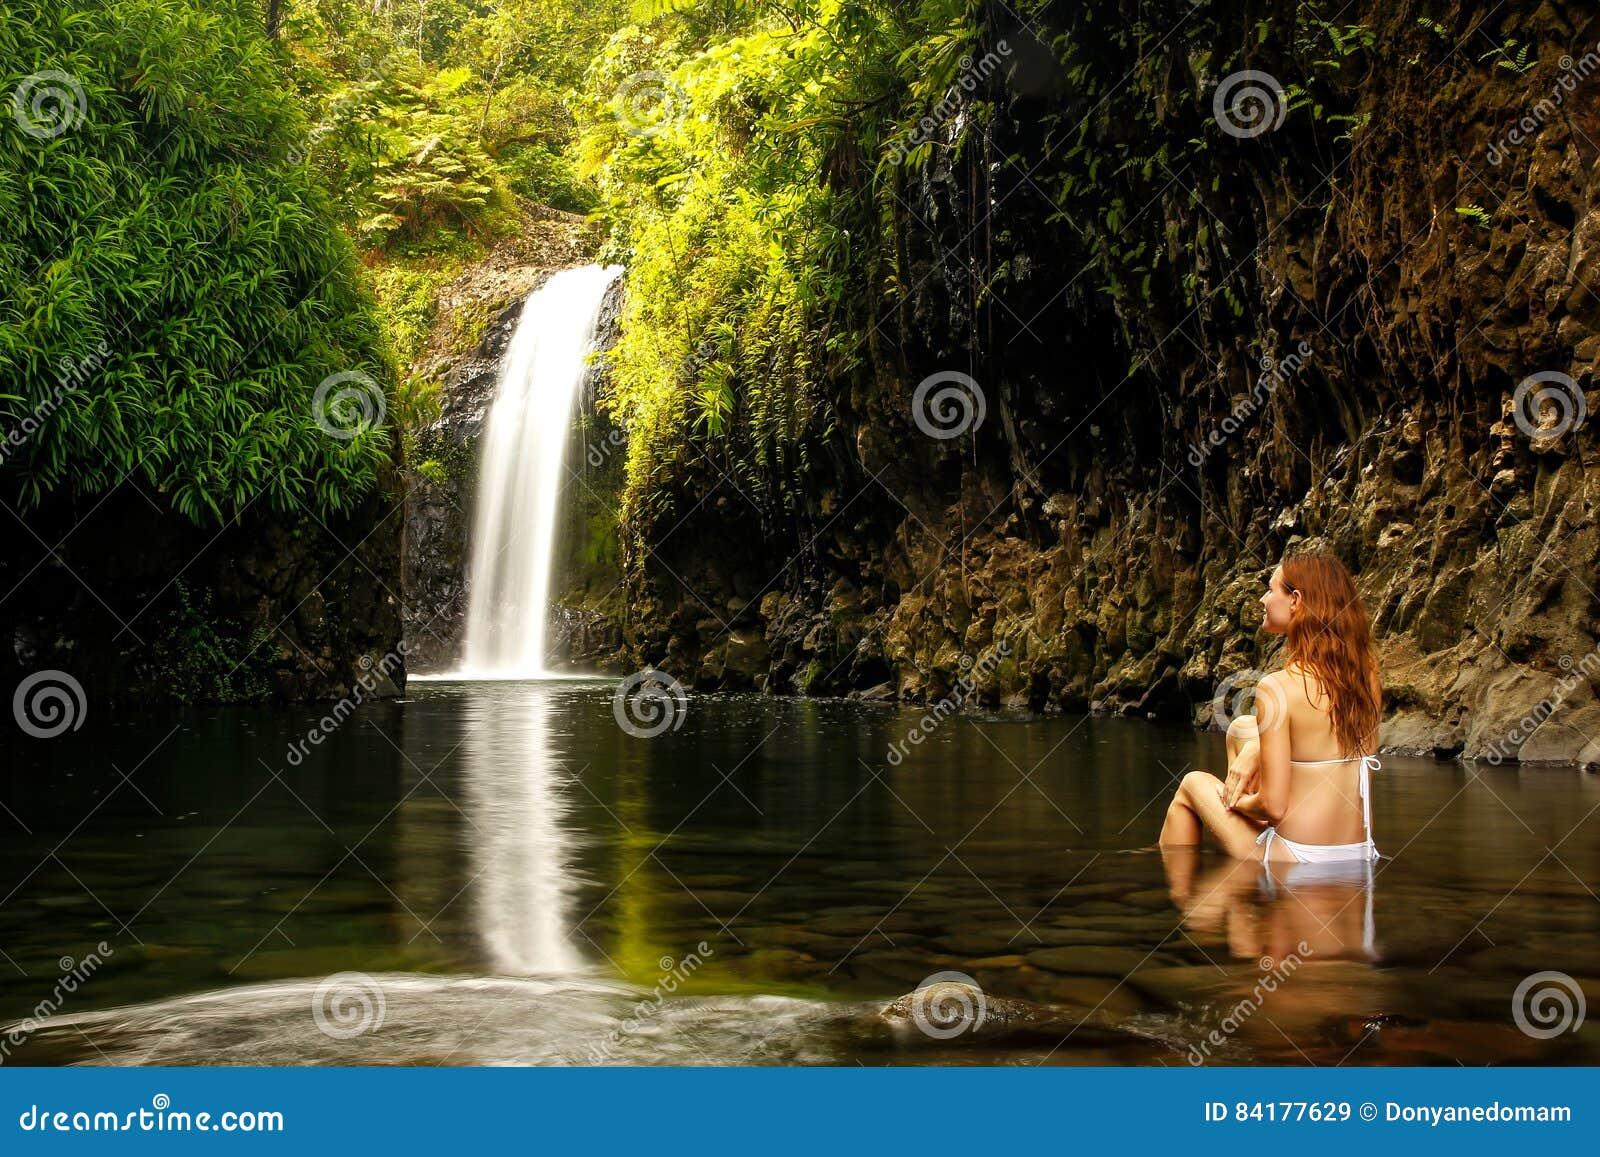 Woman Sitting At Erawan Waterfall In Thailand. Beautiful